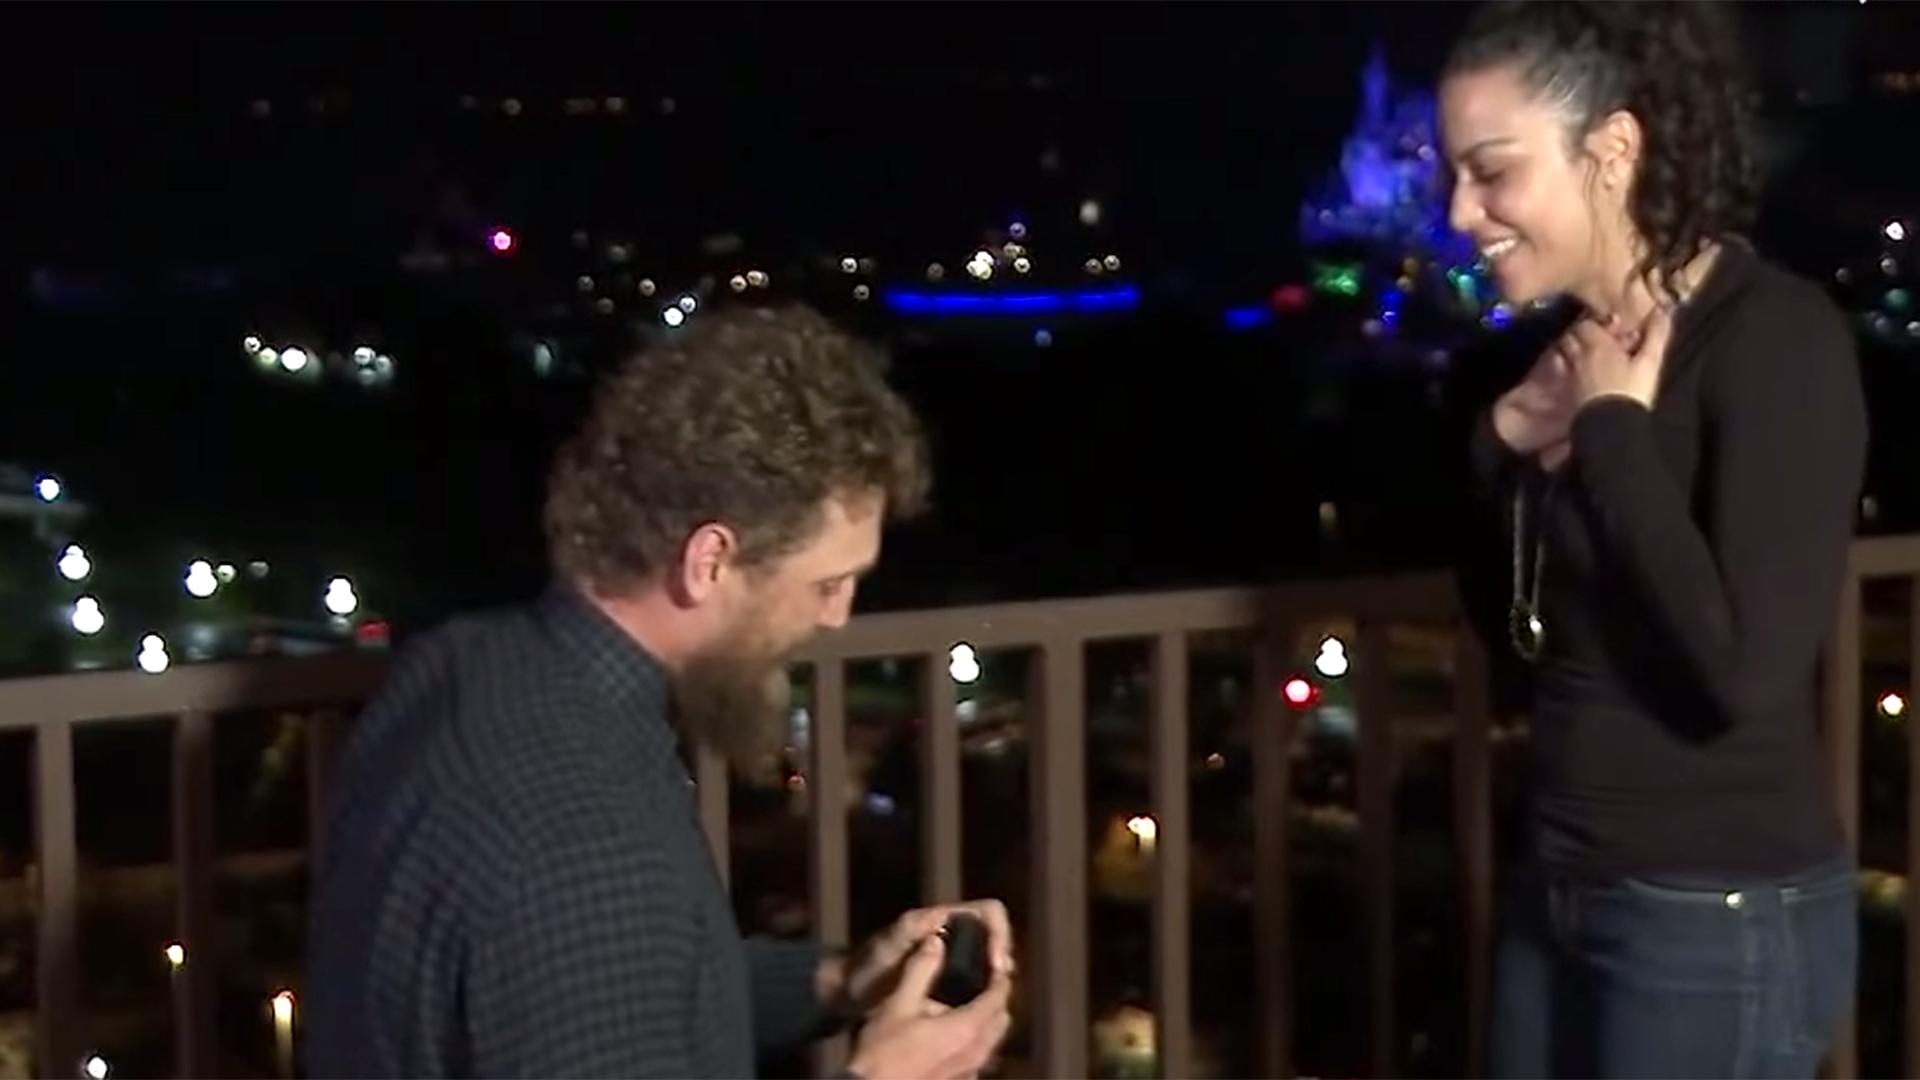 MLB Star Hunter Pence Pulls Off Magical Wedding Proposal